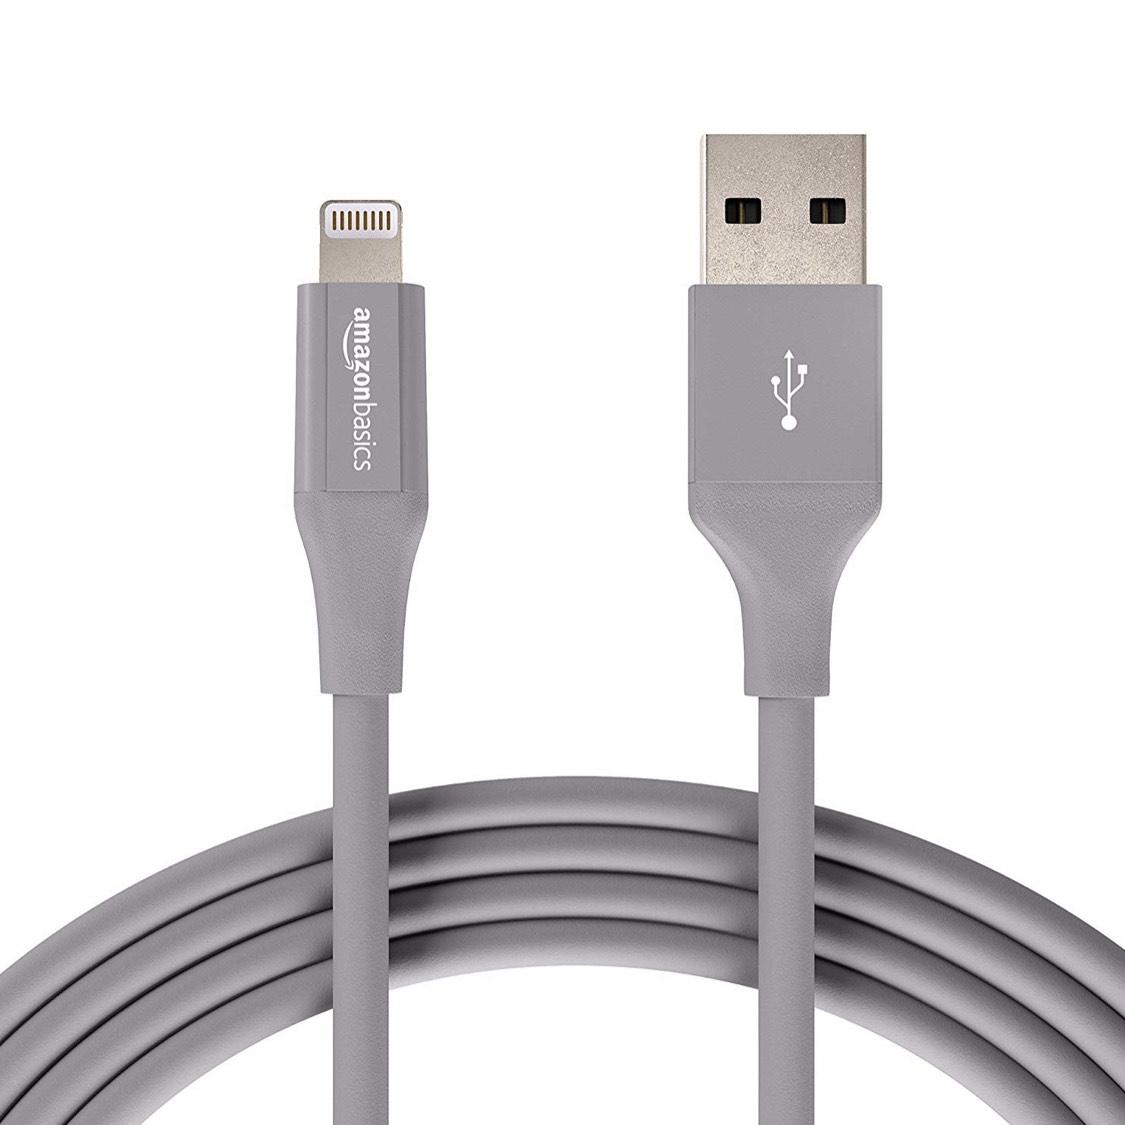 12 stuks AmazonBasics Lightning naar USB A-kabel